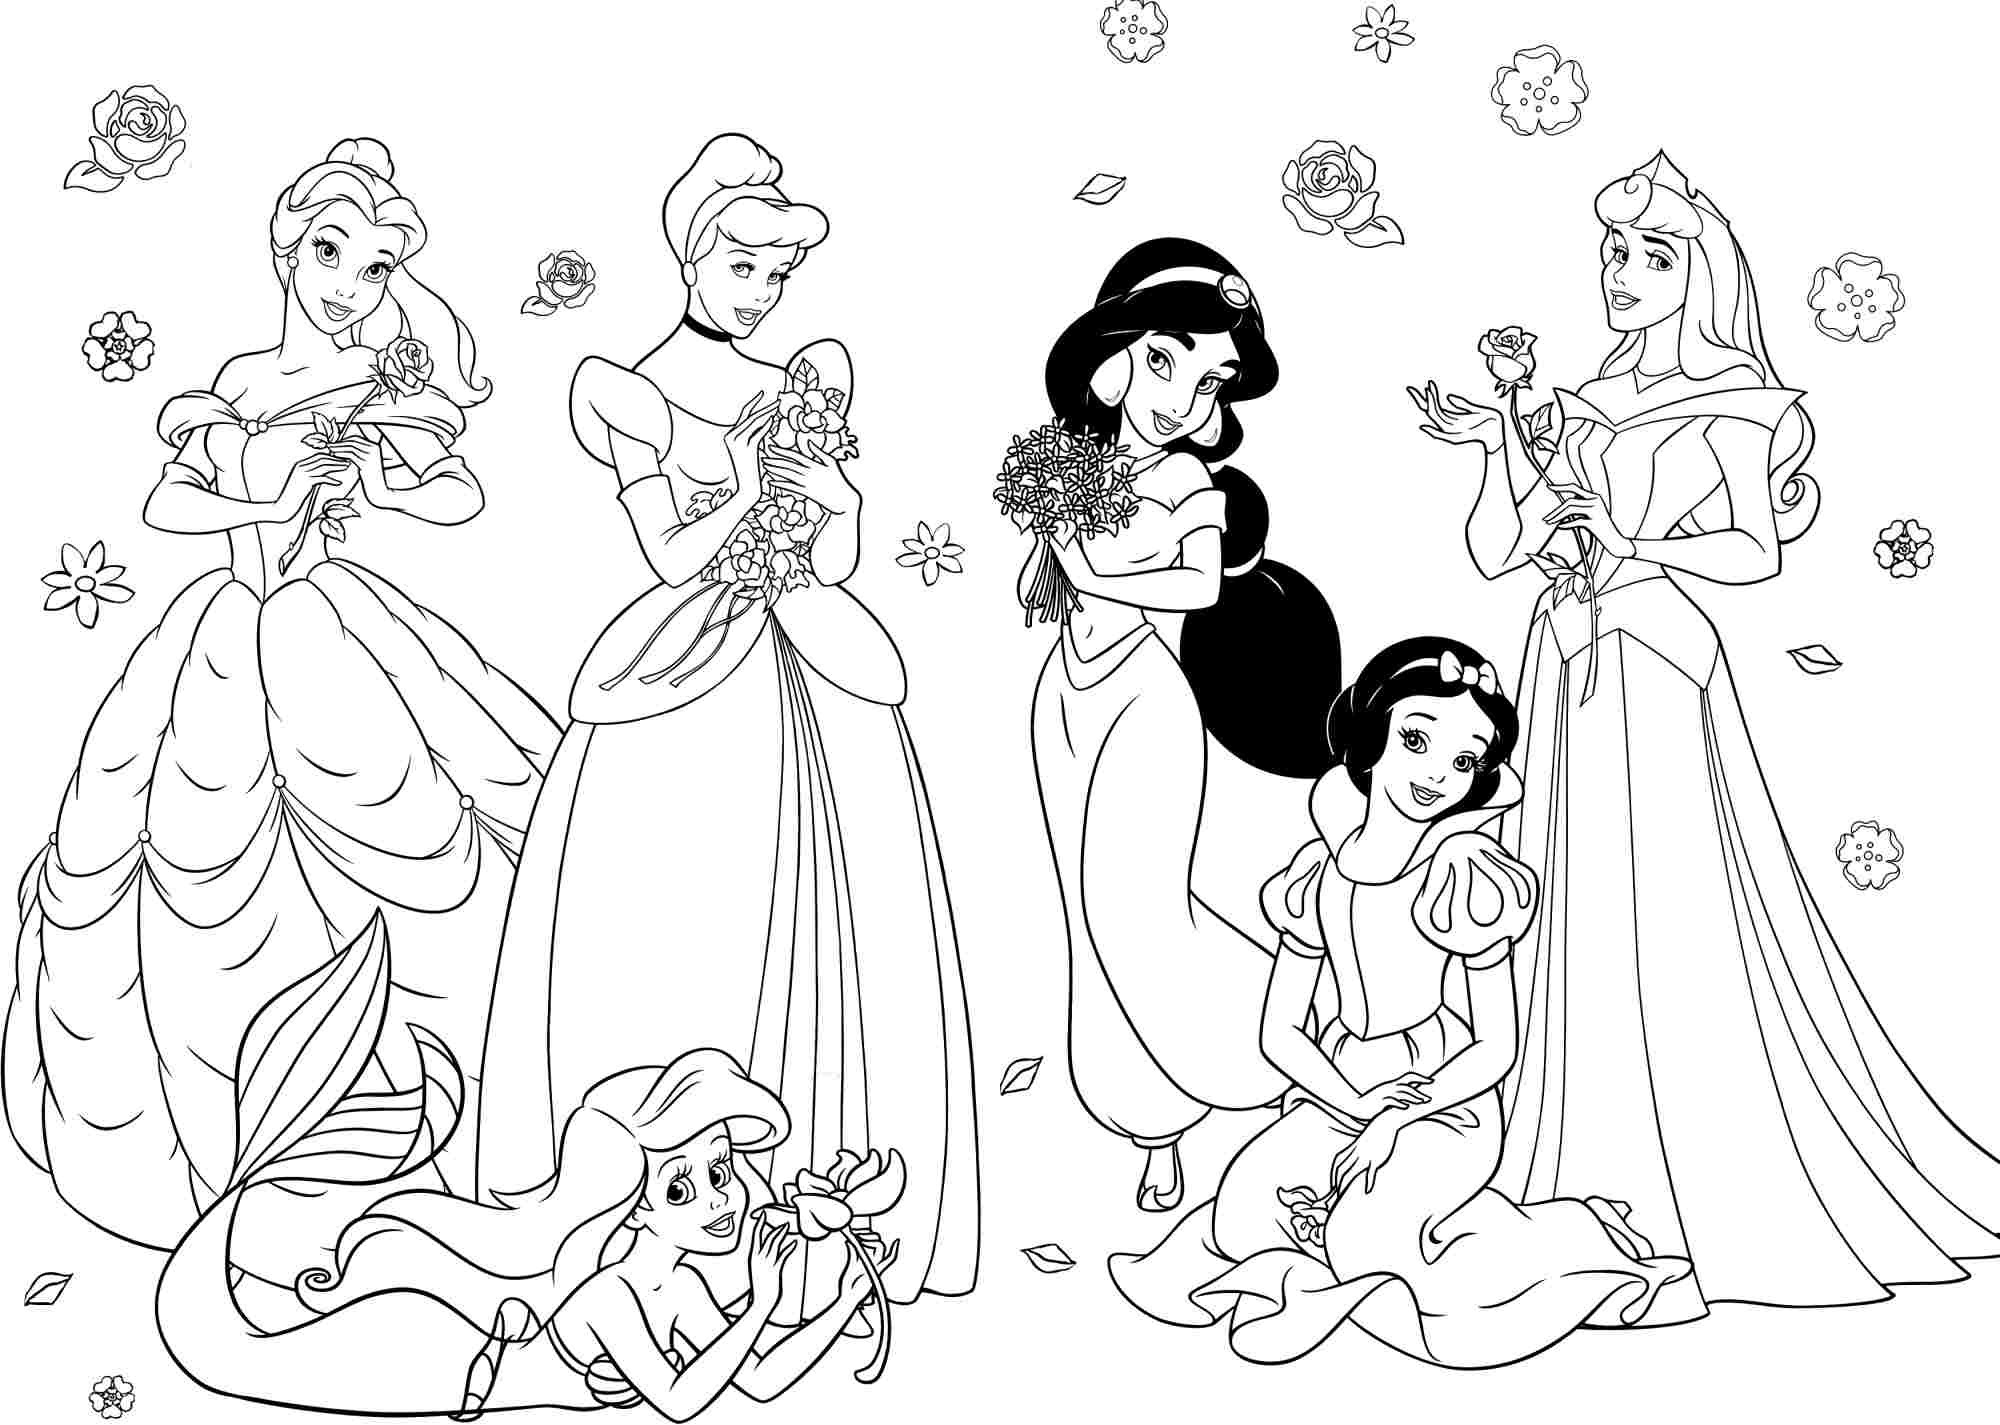 The Little Mermaid Coloring Pages - Disney Kids' Games   Mermaid ...   1425x2000